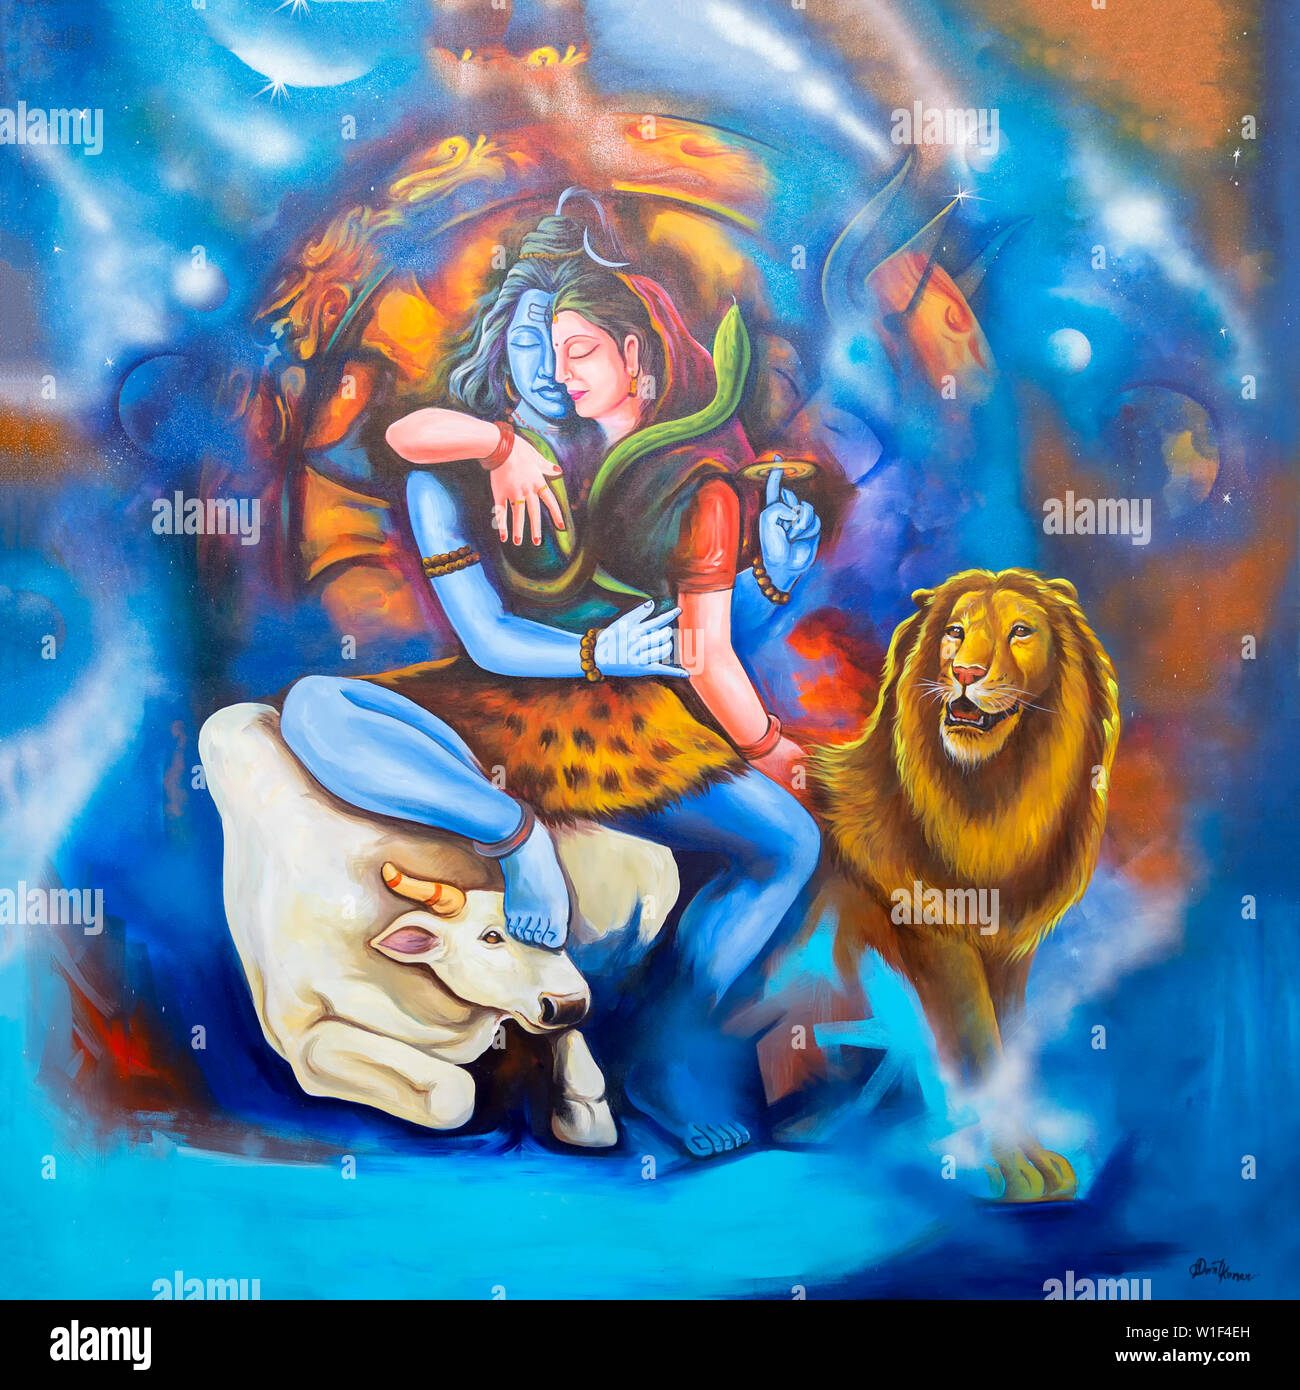 Painting representing Indian deities, For Editorial Use Only, Allahabad Kumbh Mela, World's largest religious gathering, Uttar Pradesh, India - Stock Image